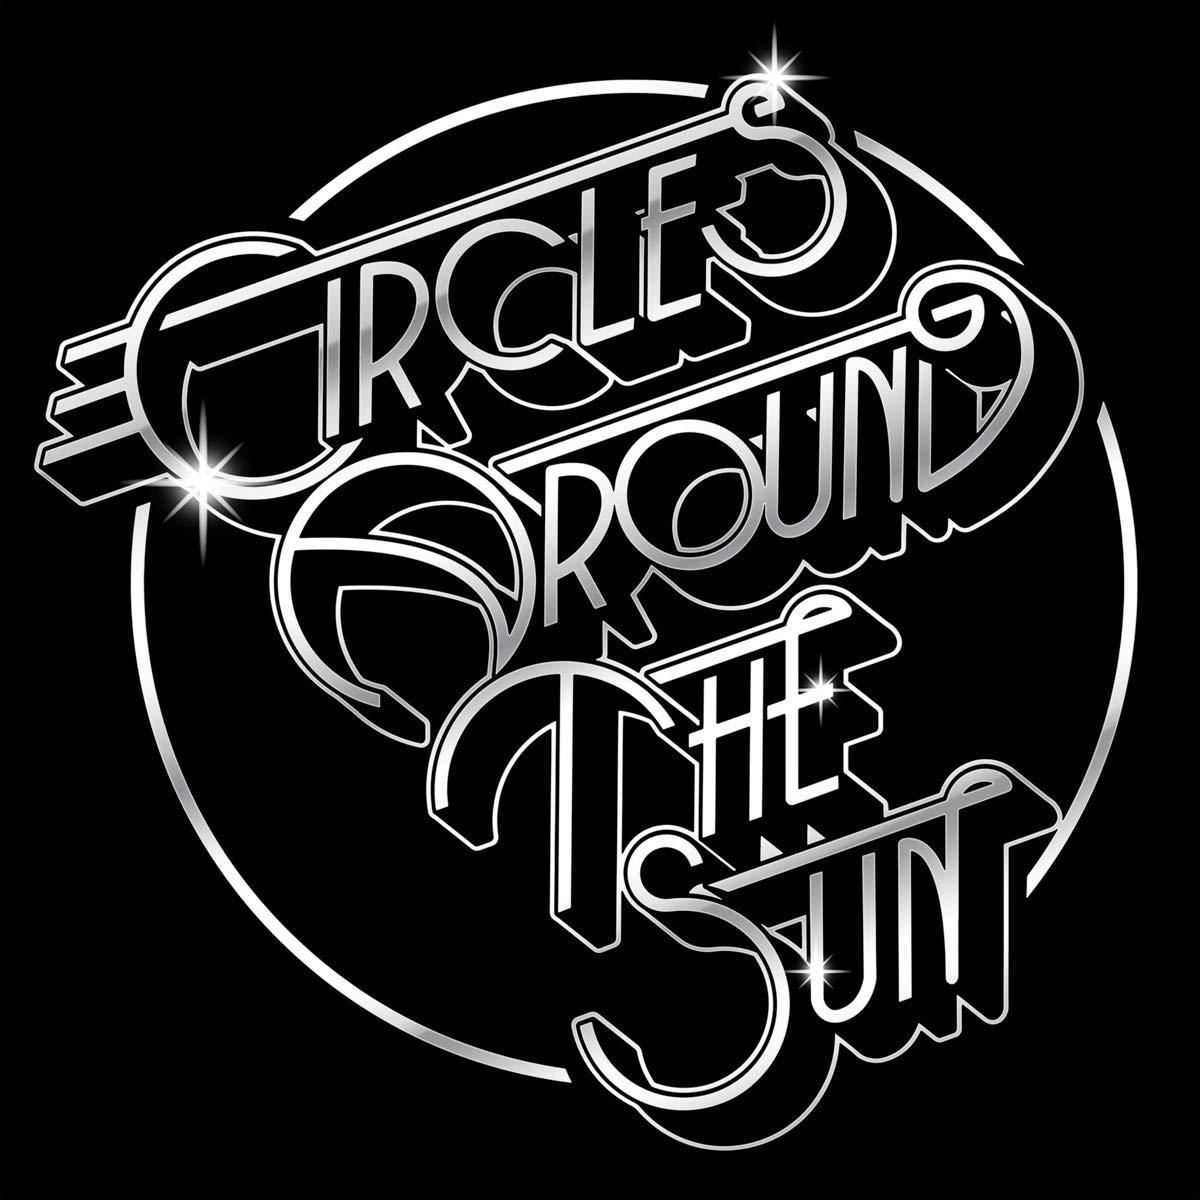 Circles Around The Sun – Circles Around The Sun (2020) [FLAC]